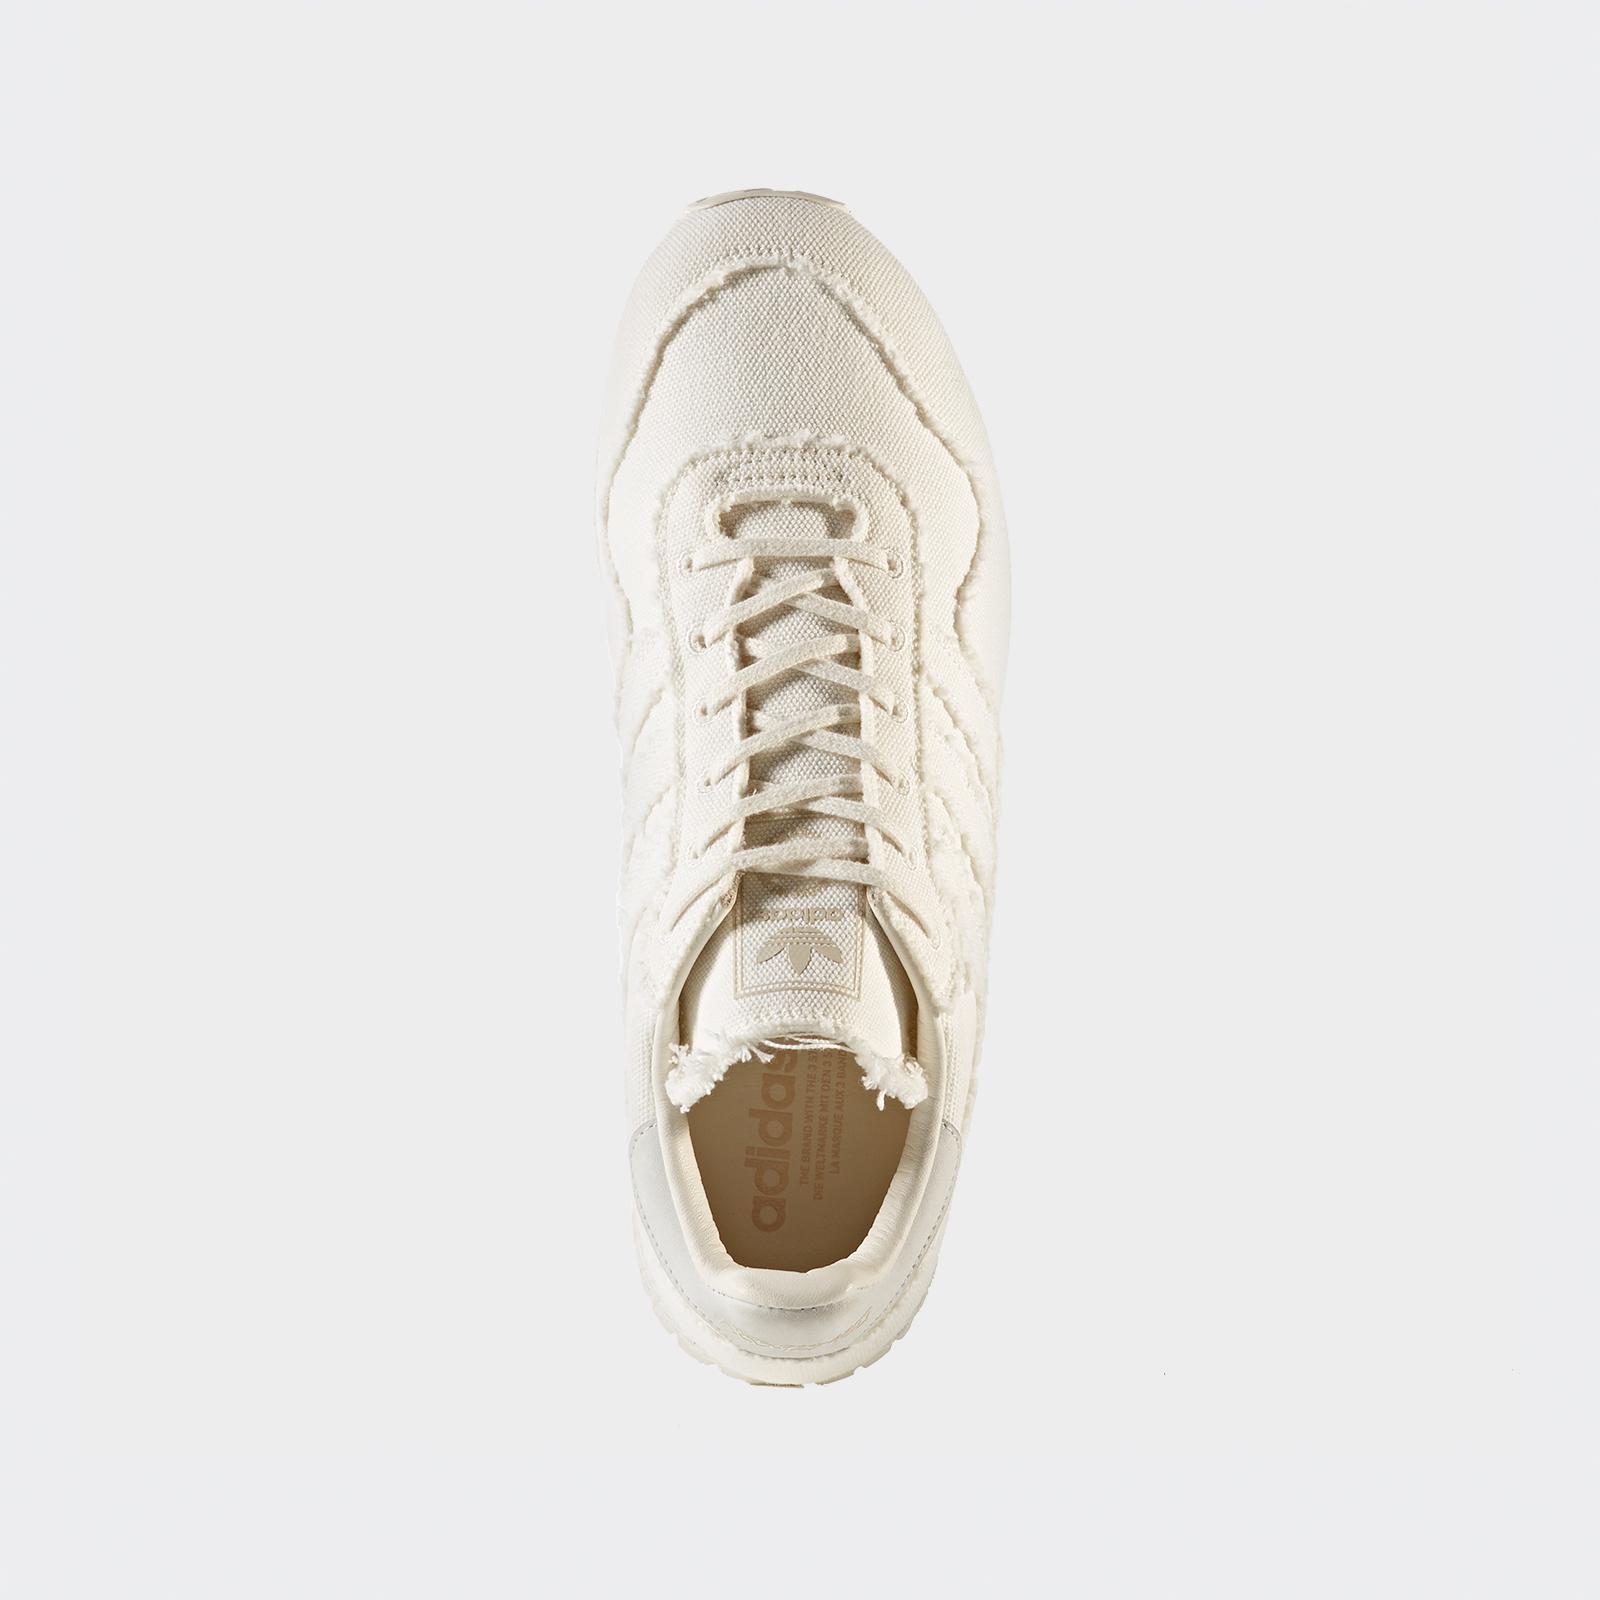 separation shoes 83cd1 ac0f5 ... adidas Originals New York x Daniel Arsham ...